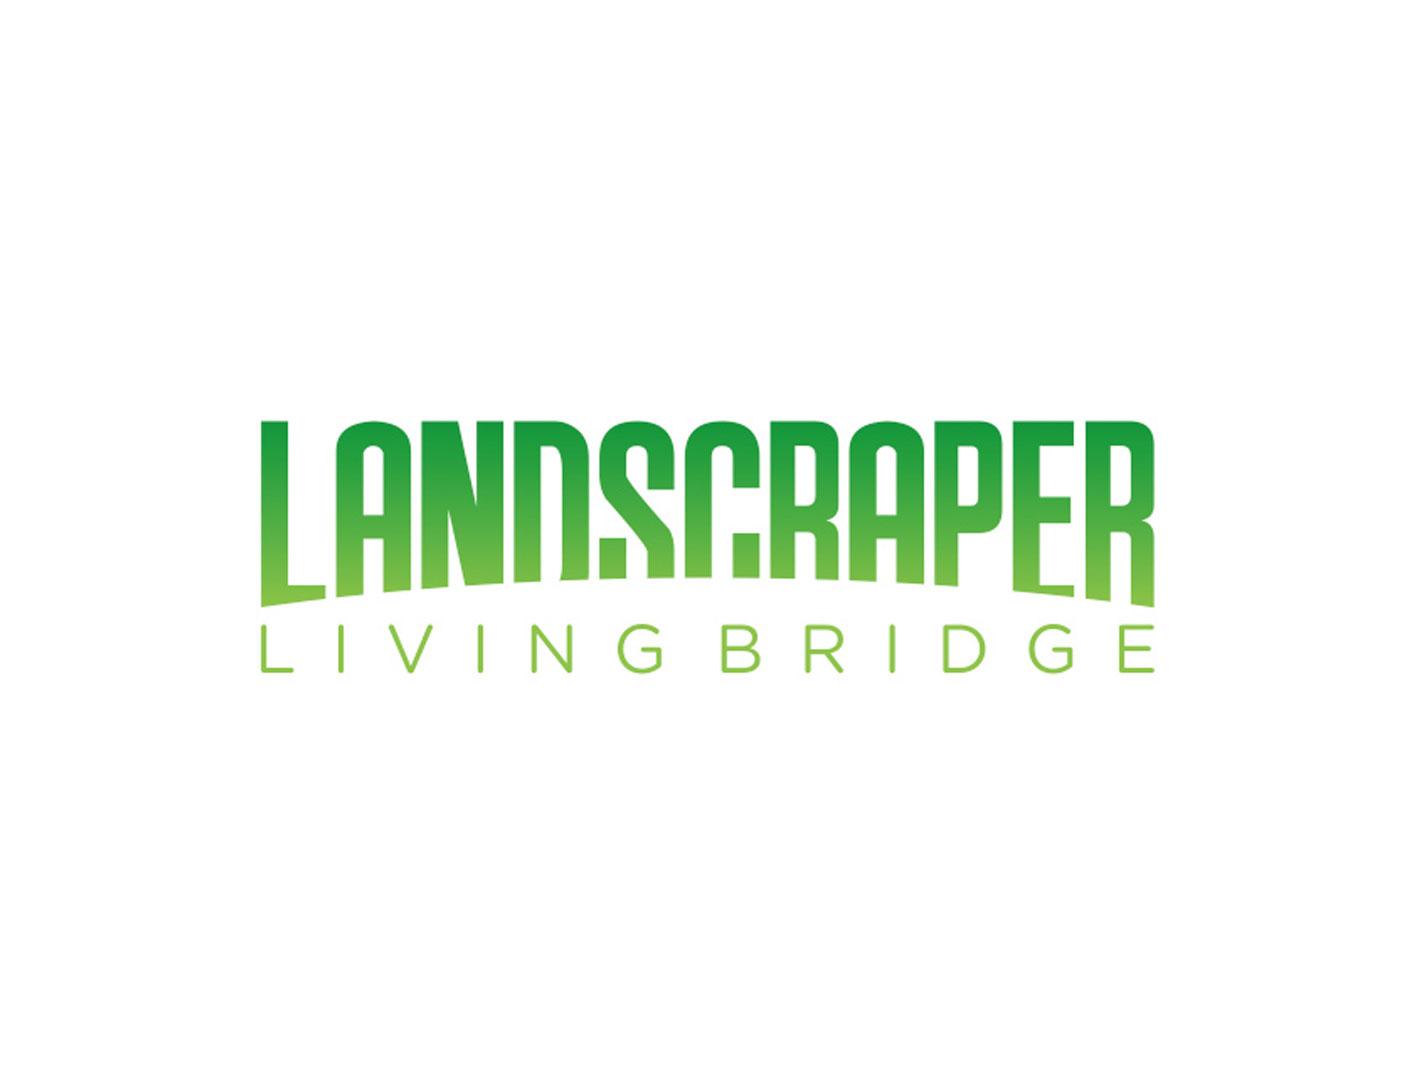 Landscraper